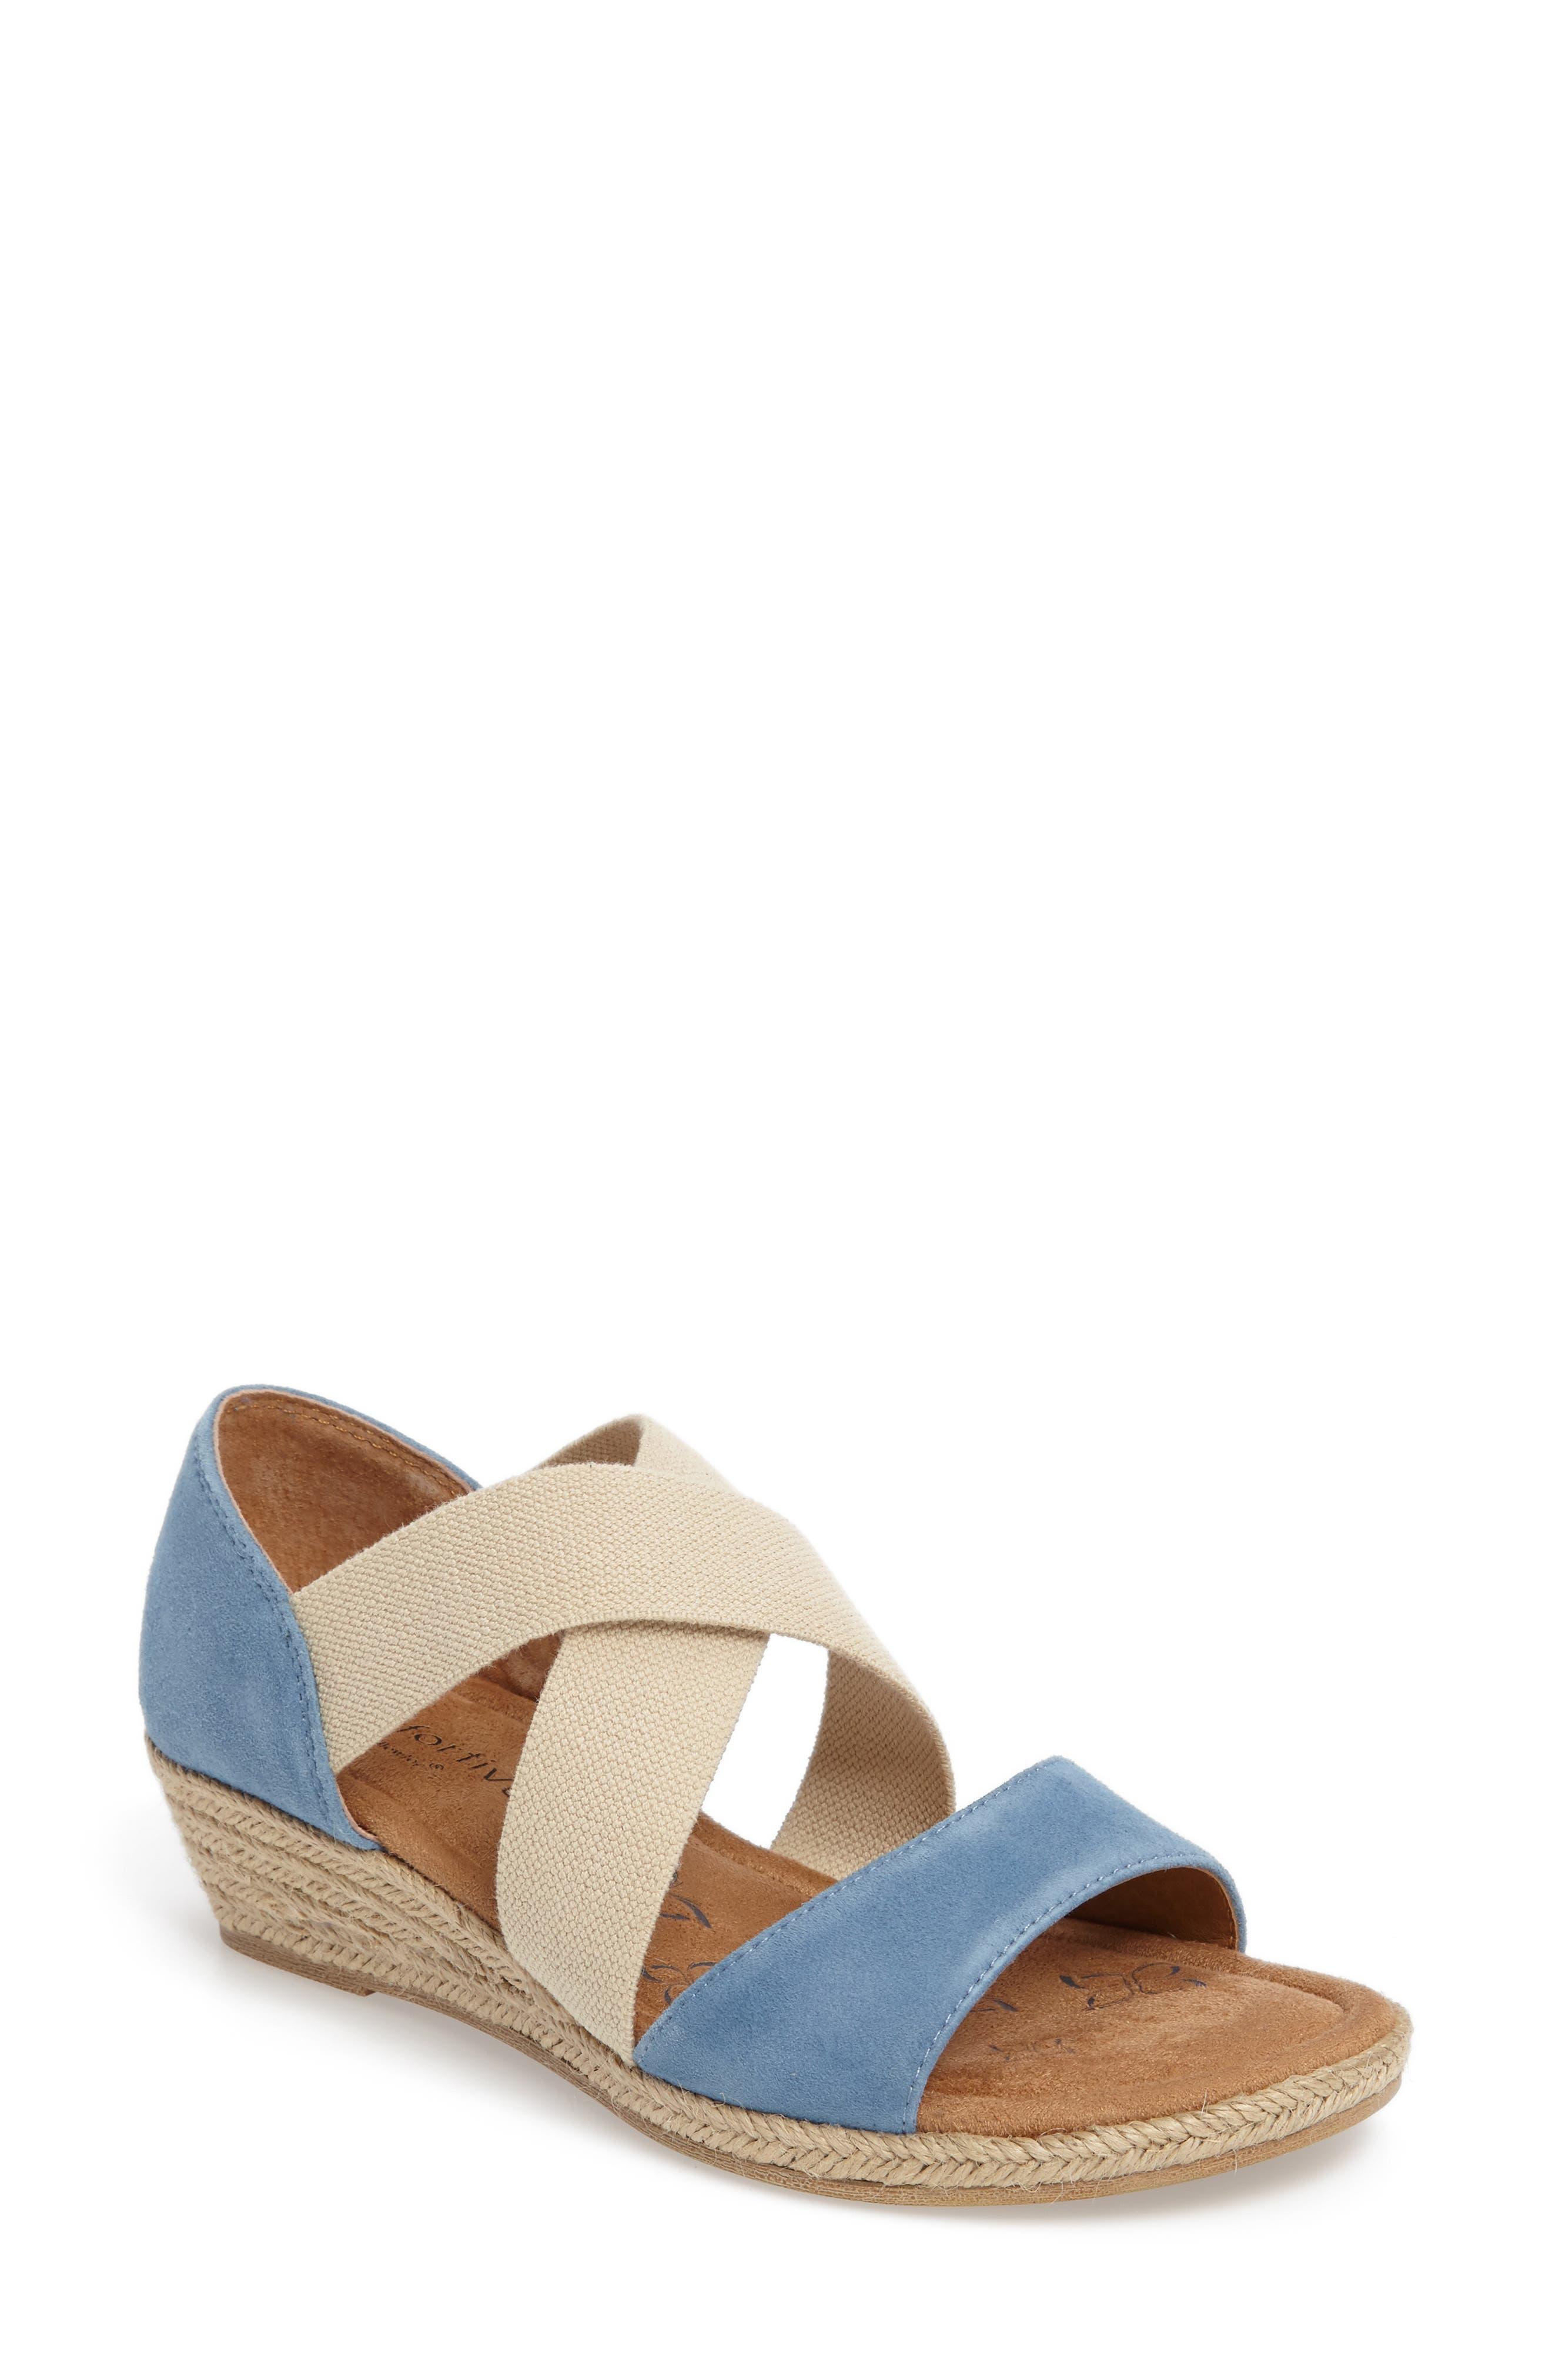 Brye Espadrille Sandal,                         Main,                         color, 420